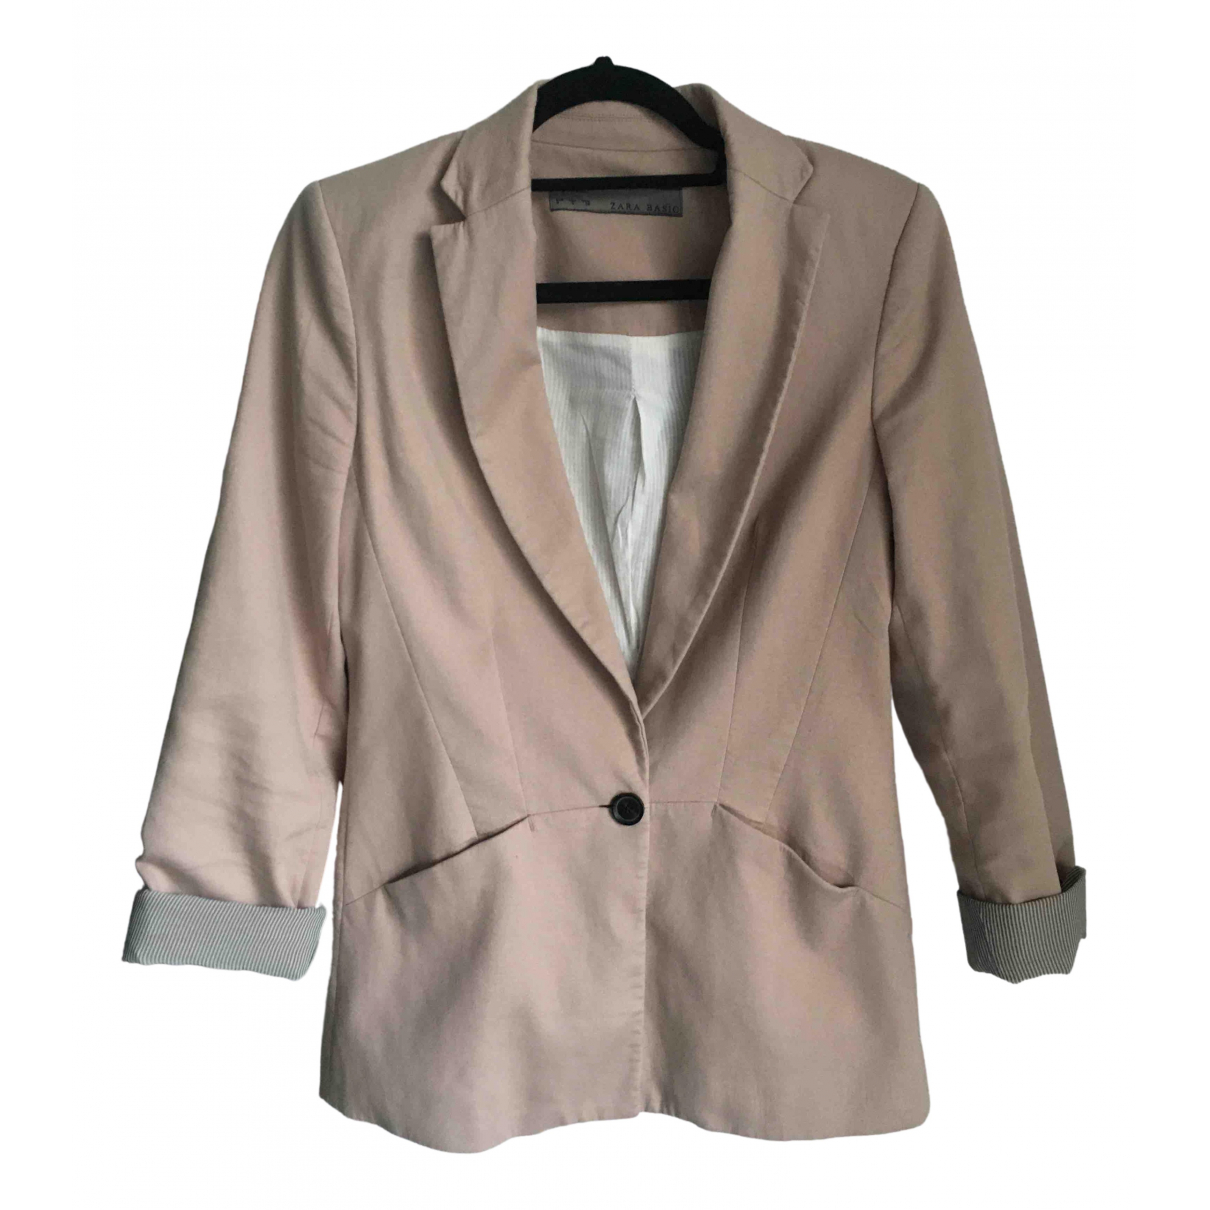 Zara \N Pink Cotton jacket for Women S International